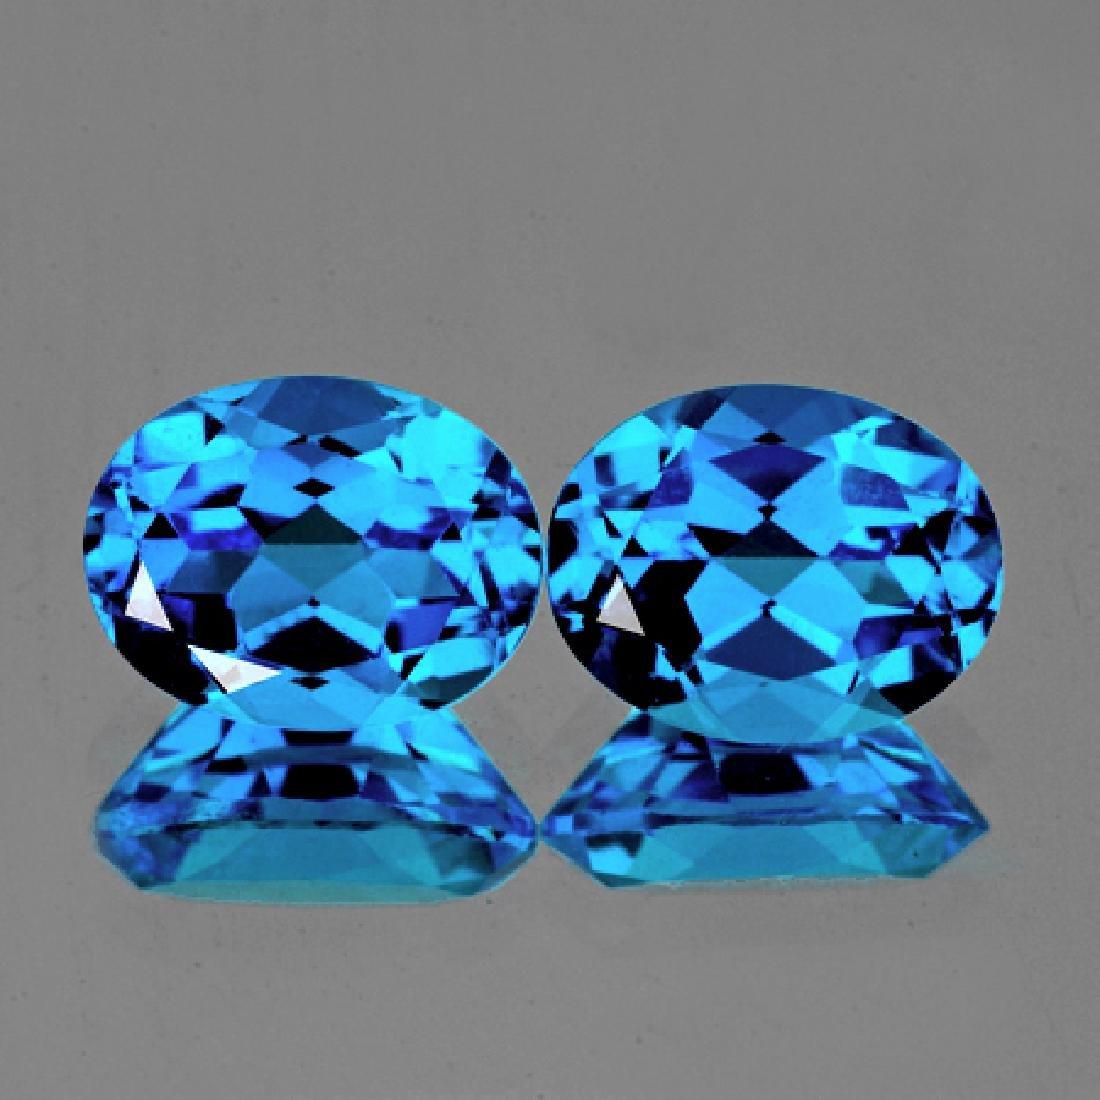 Natural Swiss Blue Topaz Pair 8x6 MM - Flawless